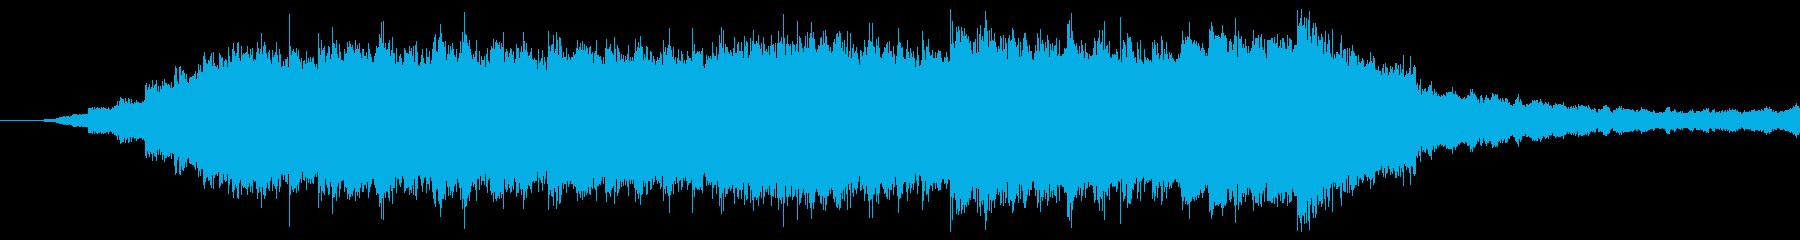 Golcondaの再生済みの波形